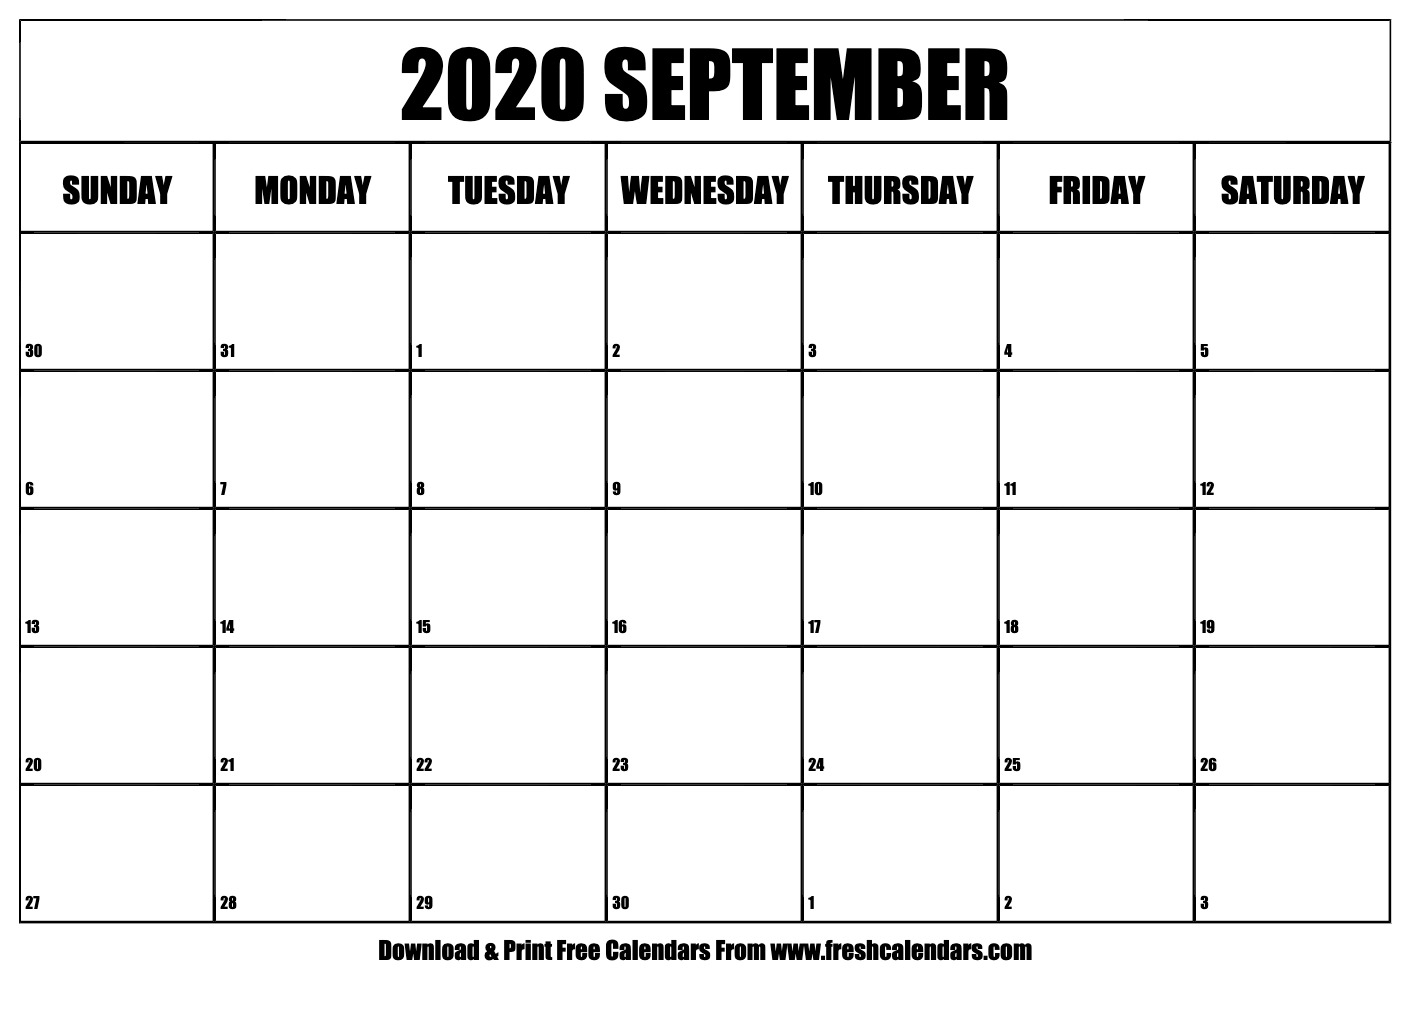 September 2020 Calendar Printable - Fresh Calendars